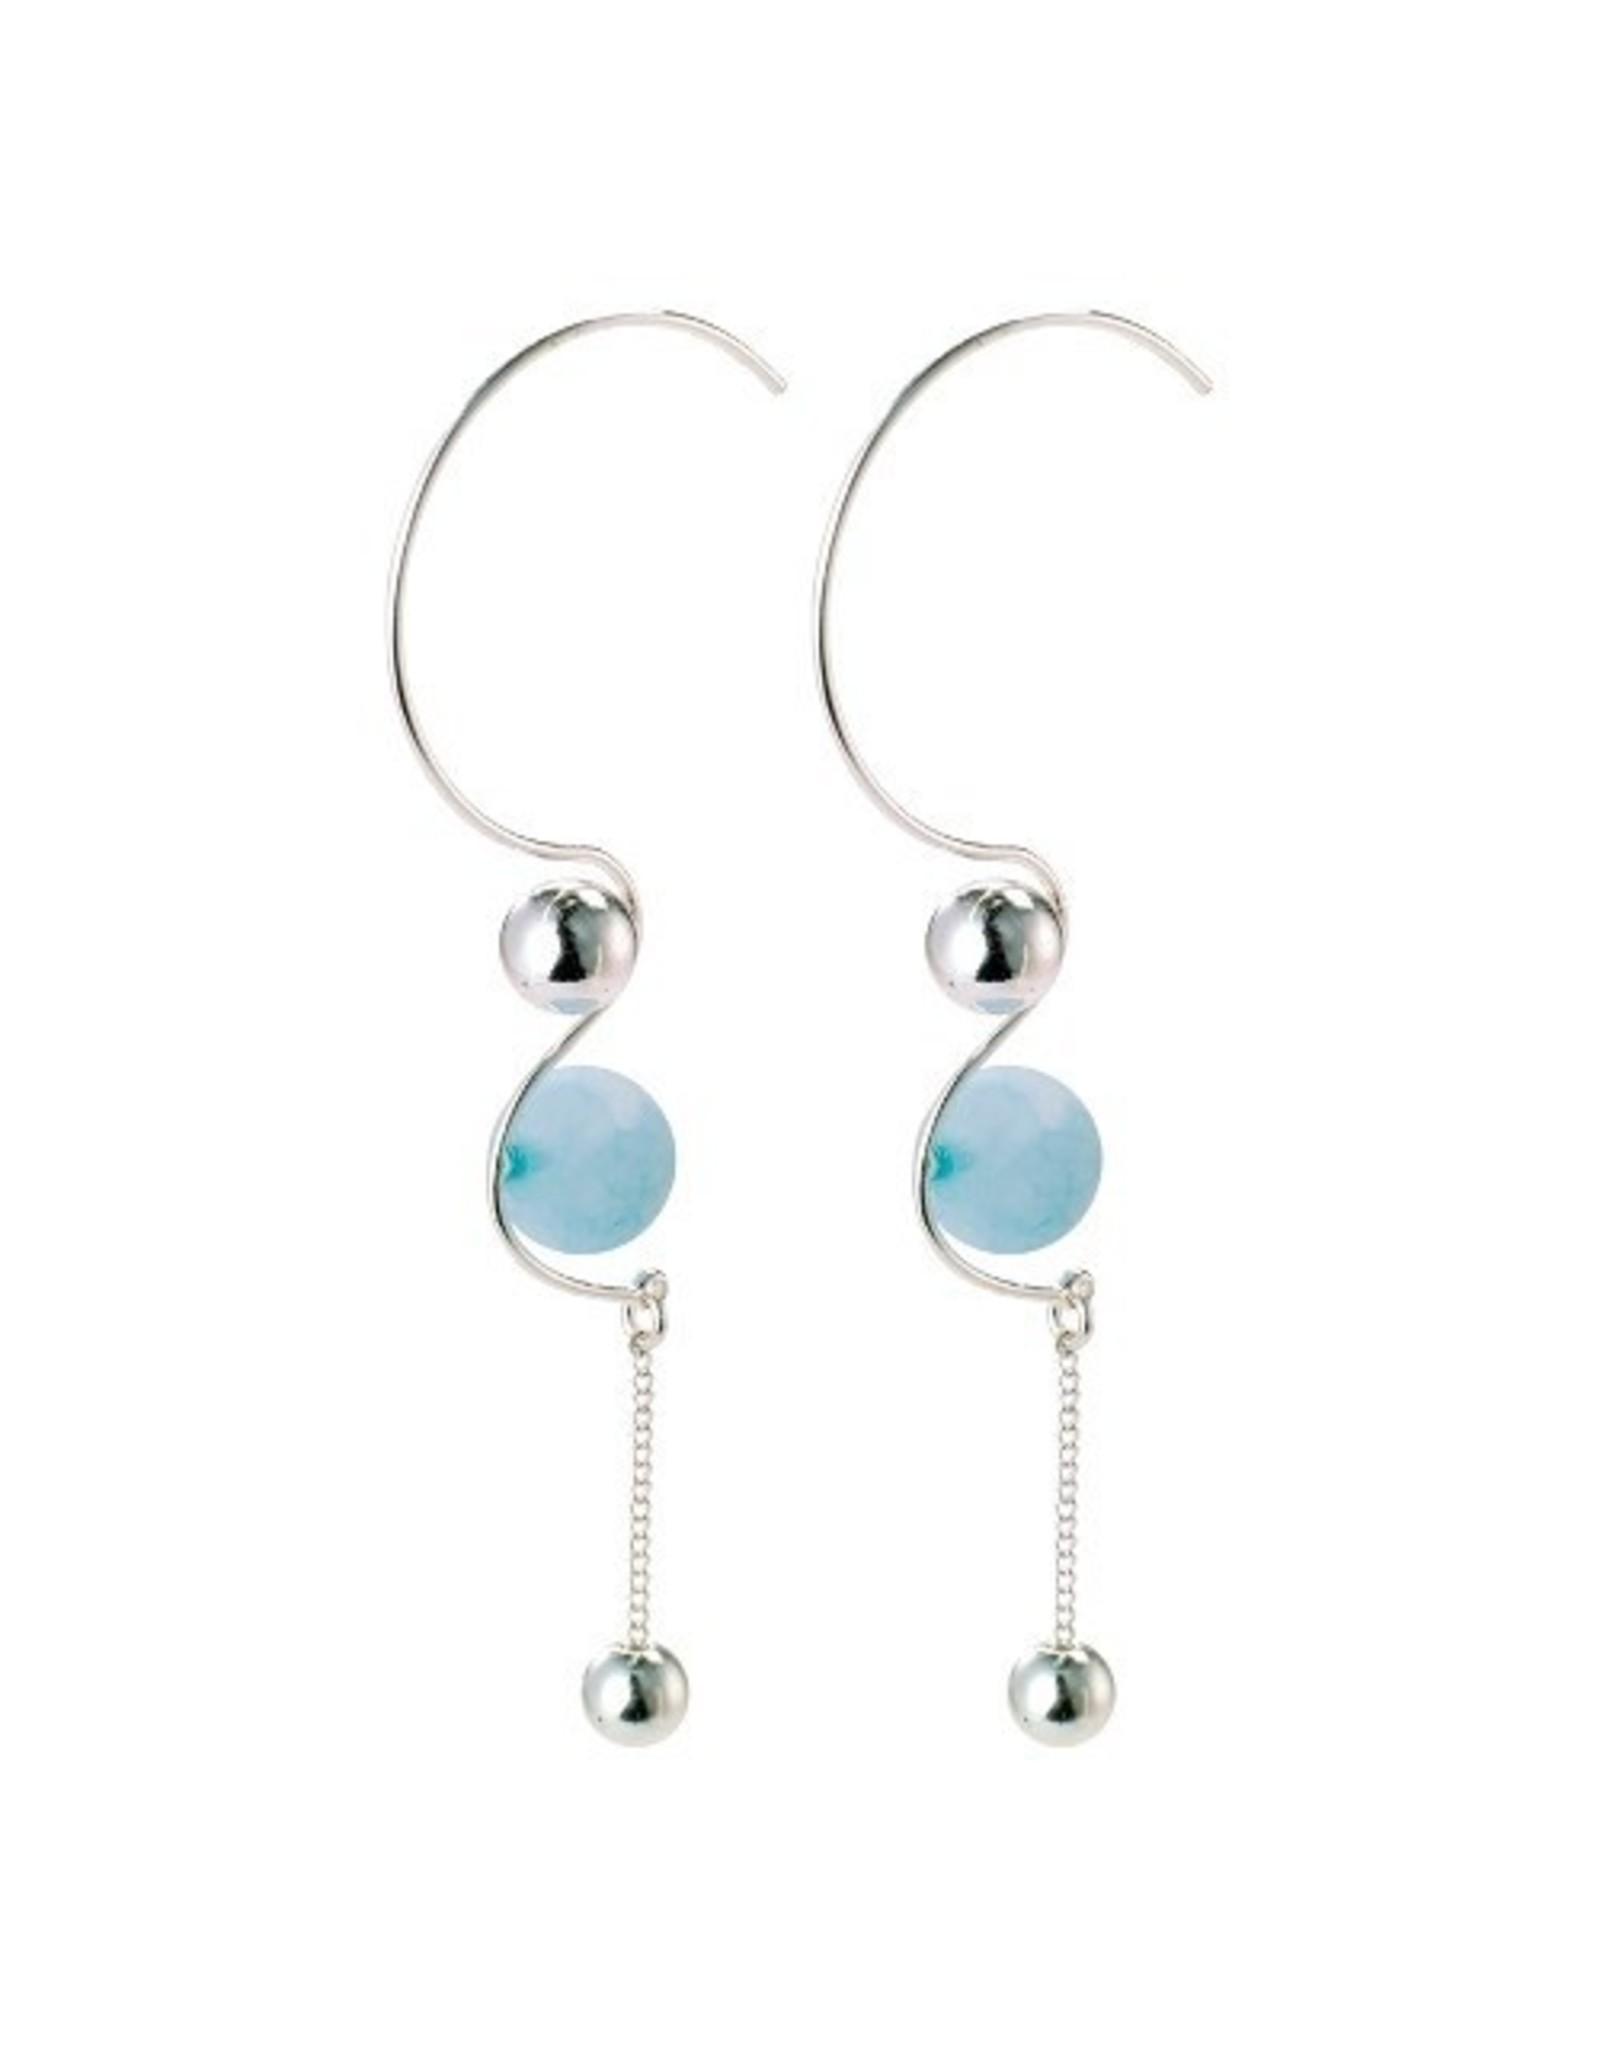 Pilgrim Pilgrim Earrings Earth silver blue aquamarine stone